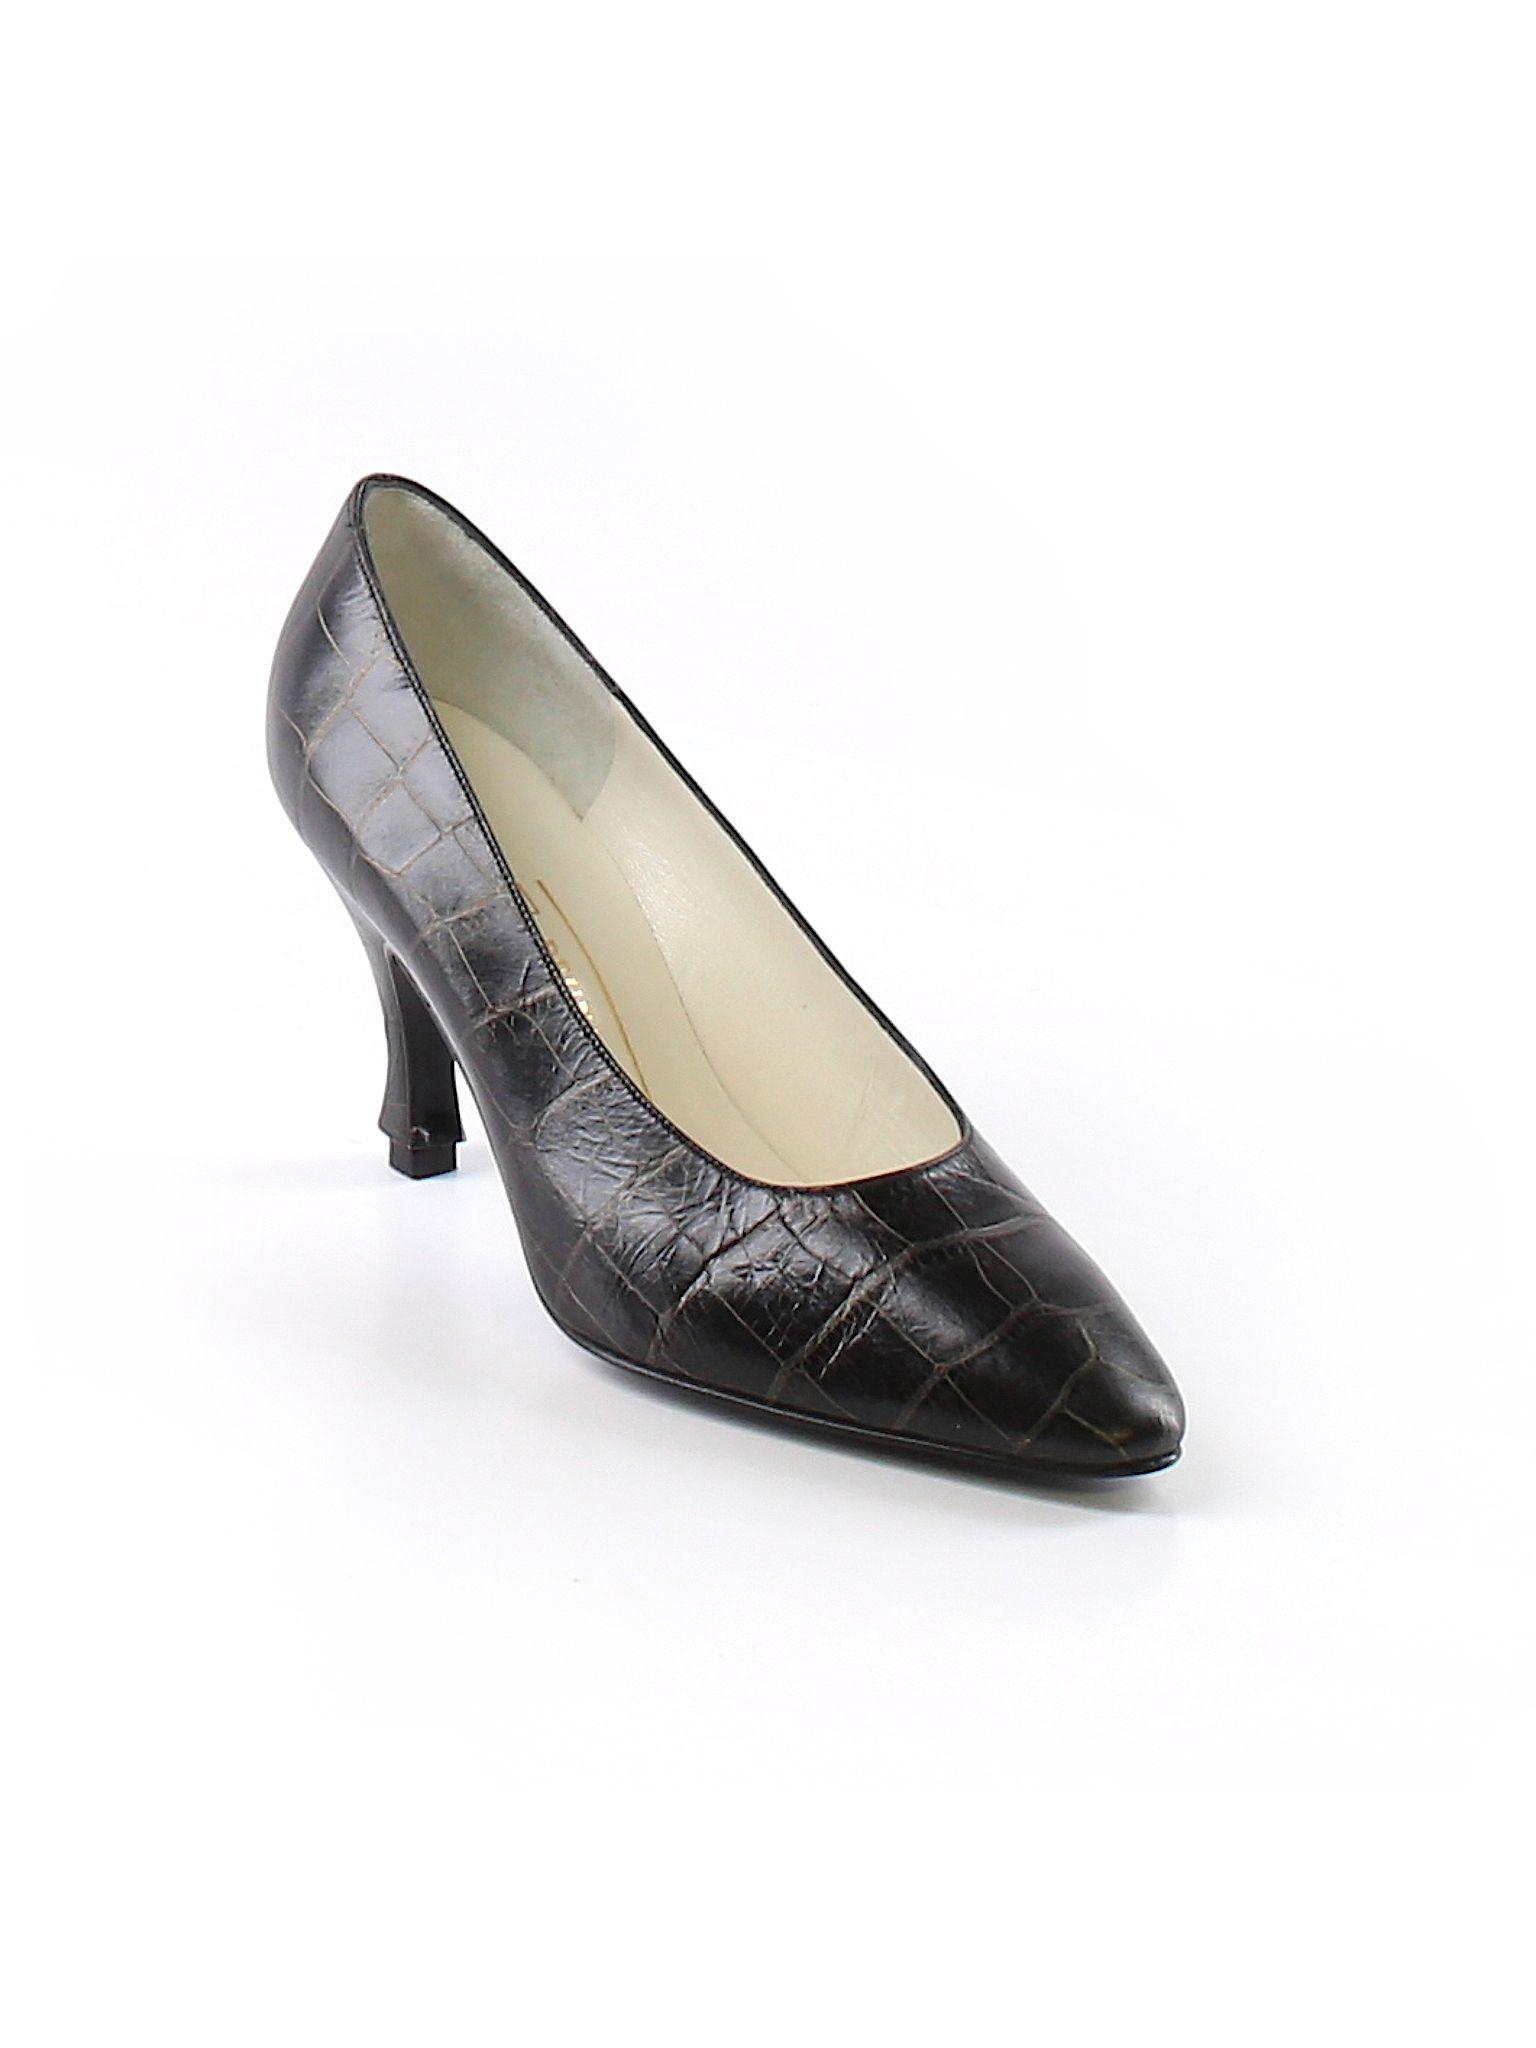 98605165a Bruno Magli Heels: Size 6 1/2 Black Women's Clothing - $50.99